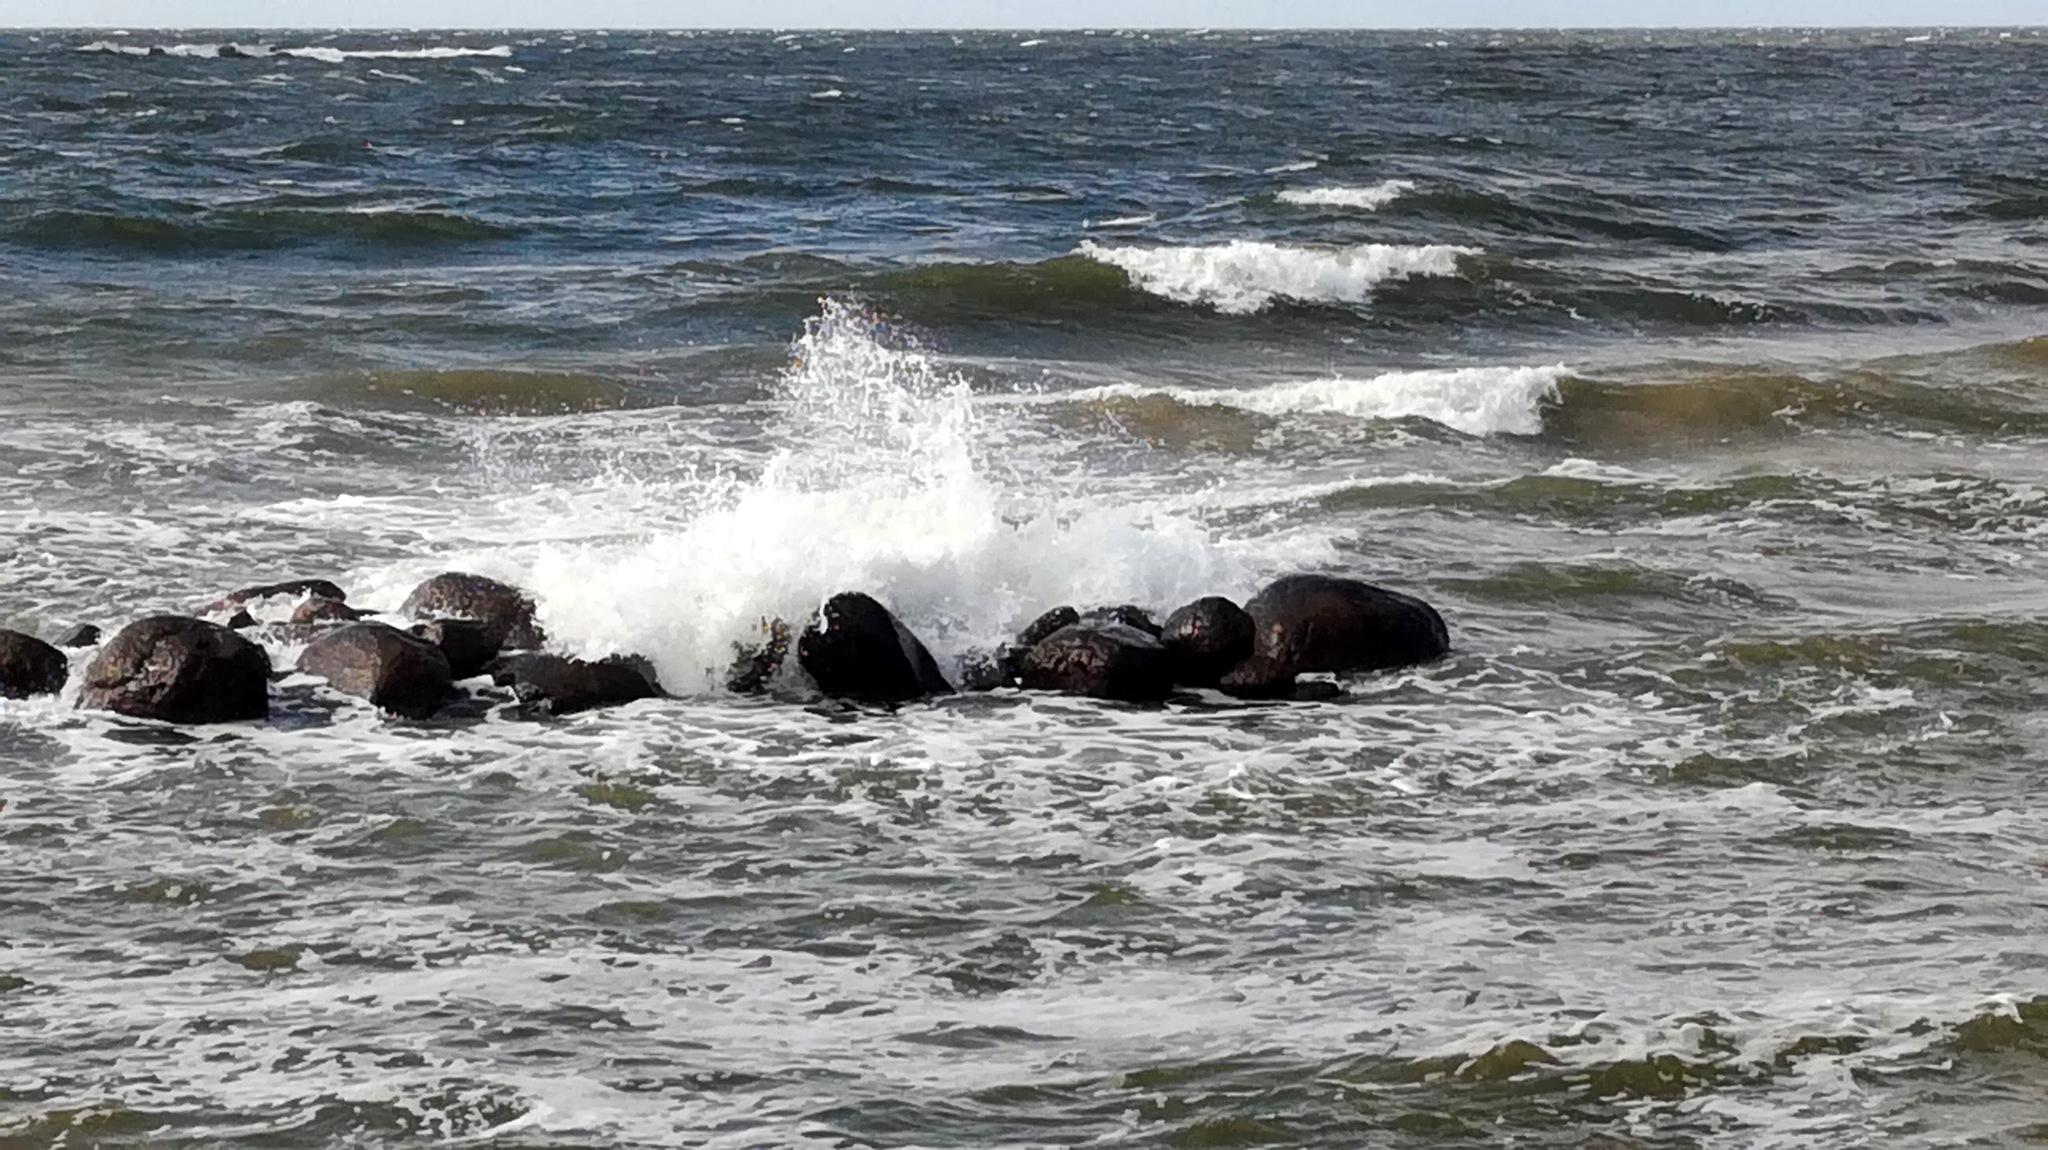 Baltic sea by uzkuraitiene62